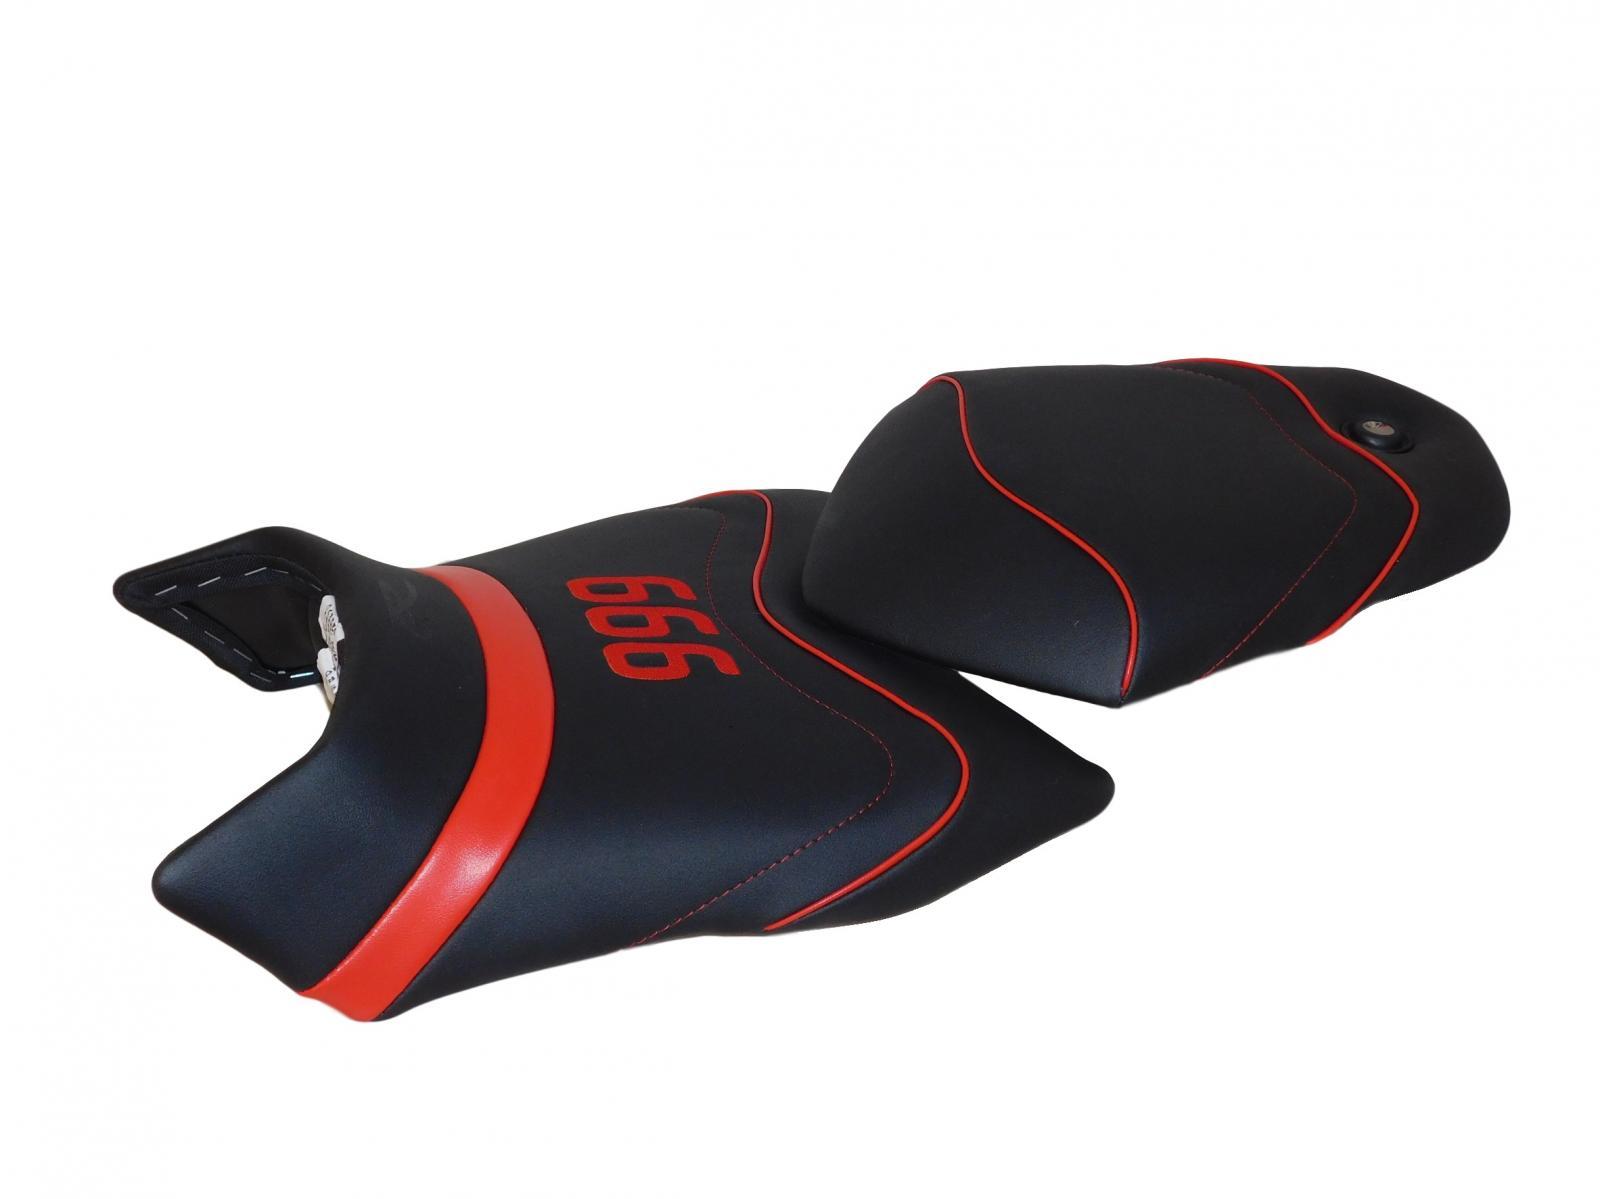 Capa de banco Design HSD5069 - MH RX 125 R